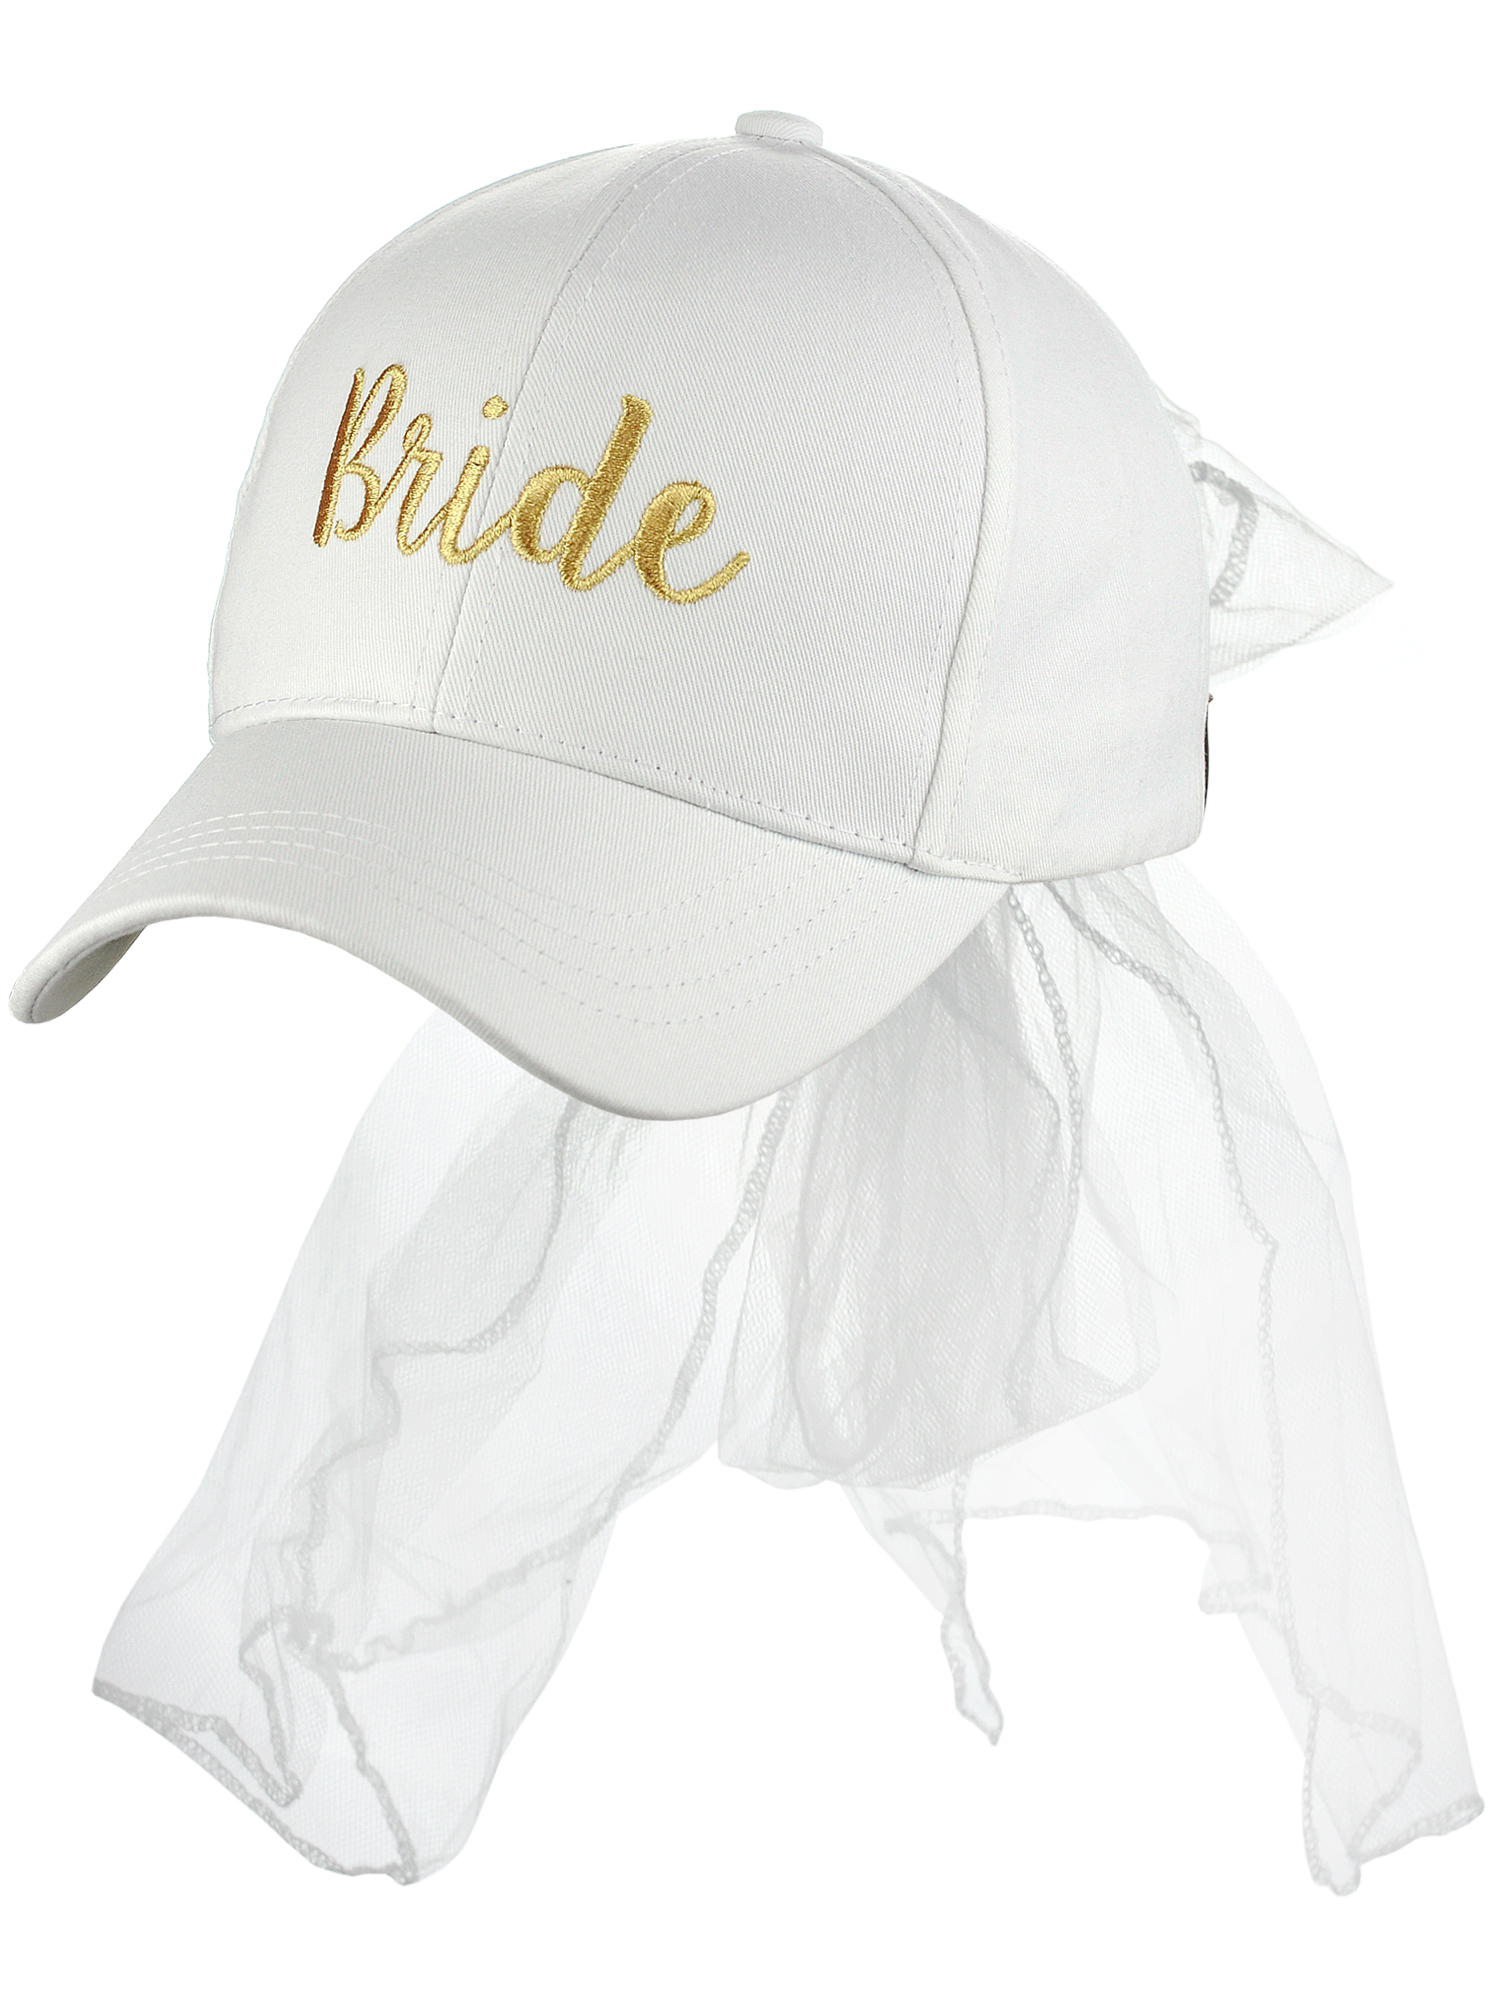 C.C Women's Bridal Metallic Gold Embroidered Adjustable Lace Veil Baseball Cap, Bride